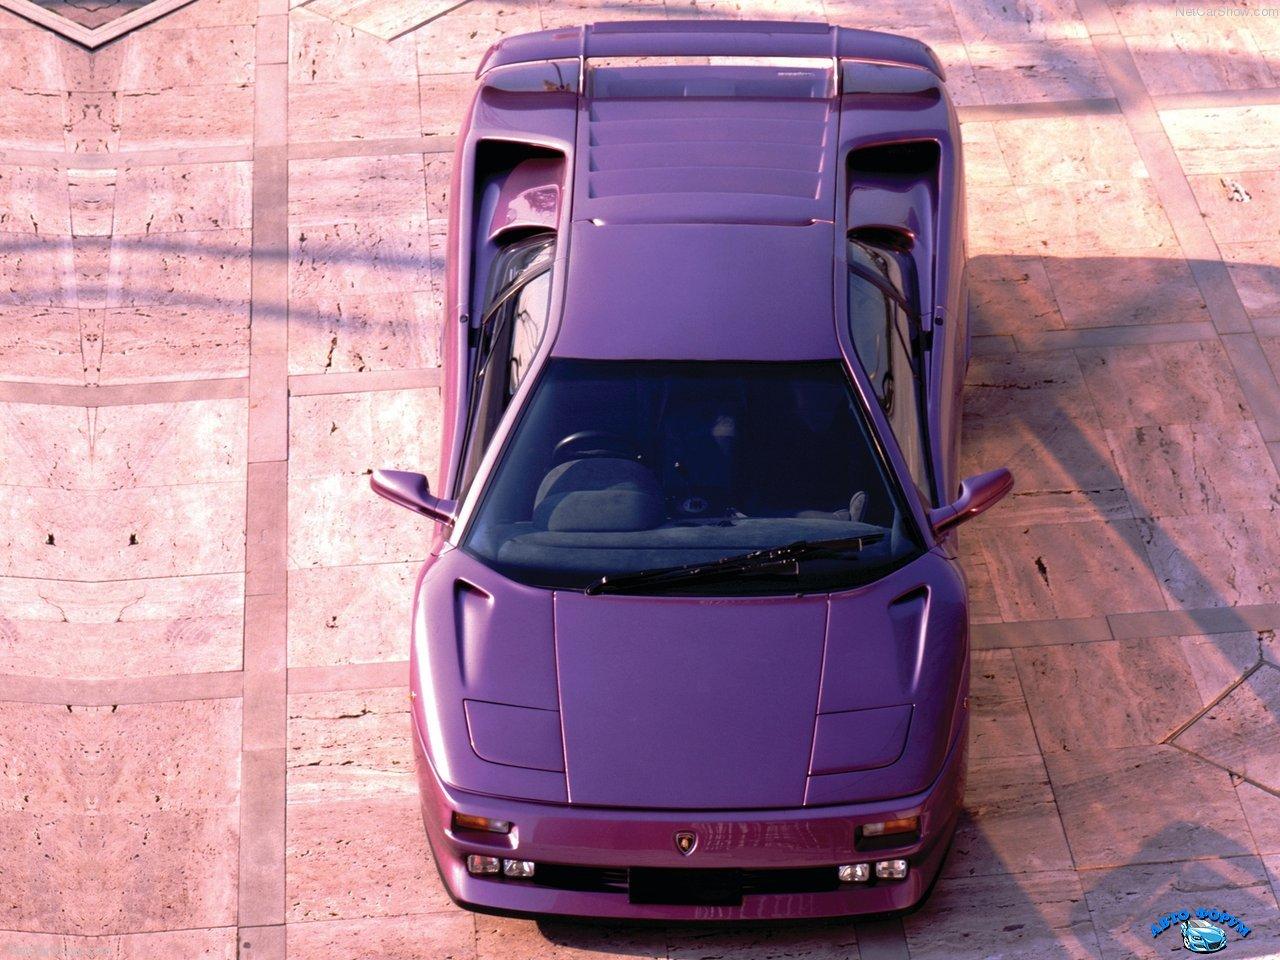 Lamborghini-Diablo_SE_1994_1280x960_wallpaper_04.jpg